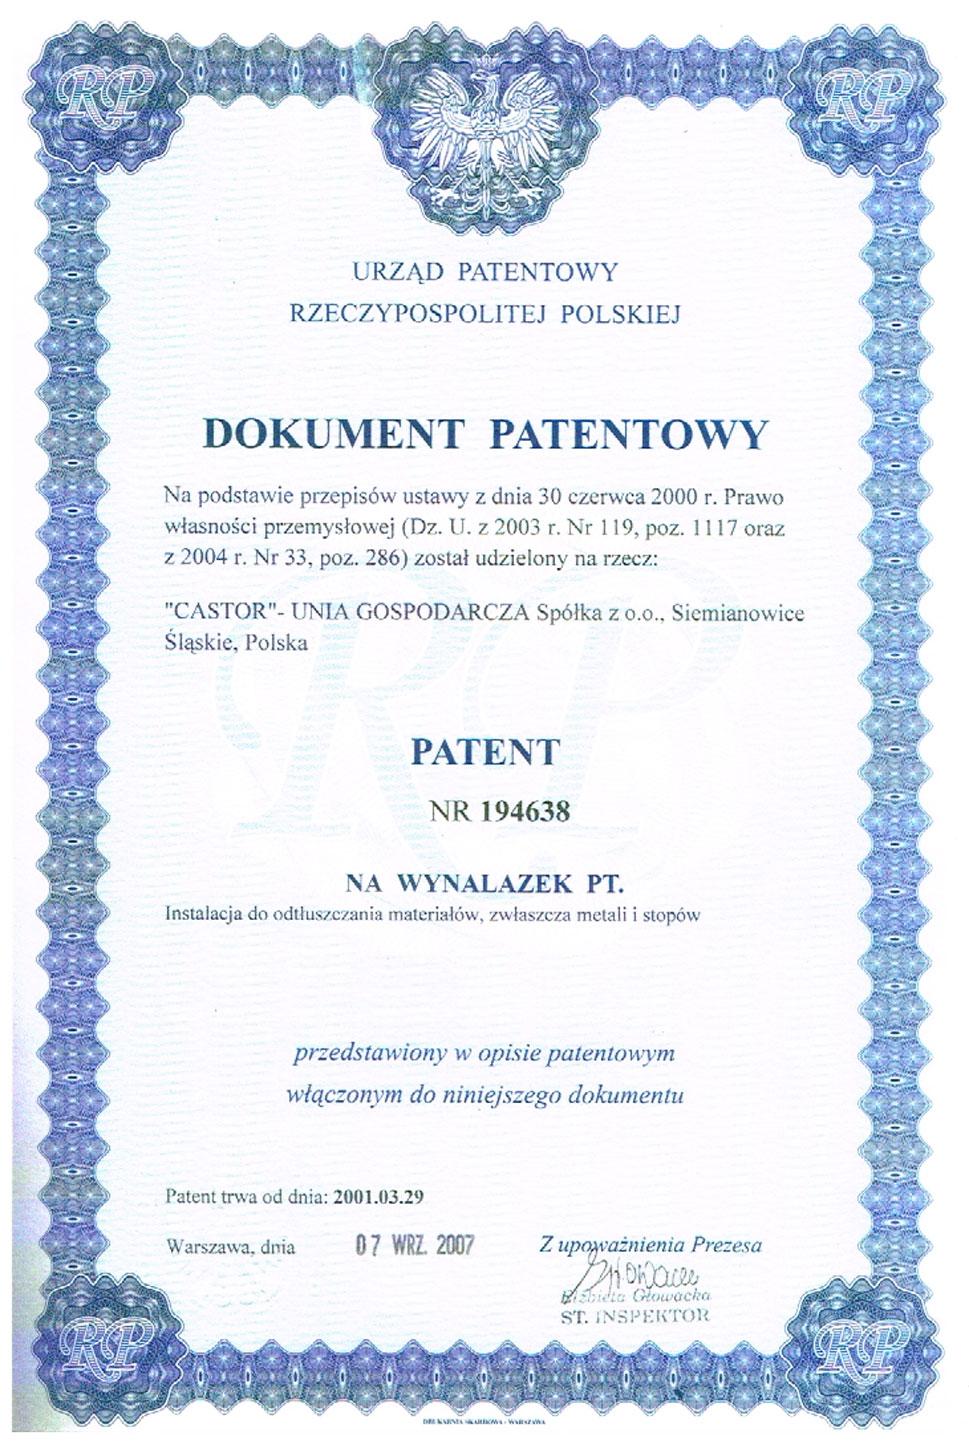 Dokument patentowy nr 194638